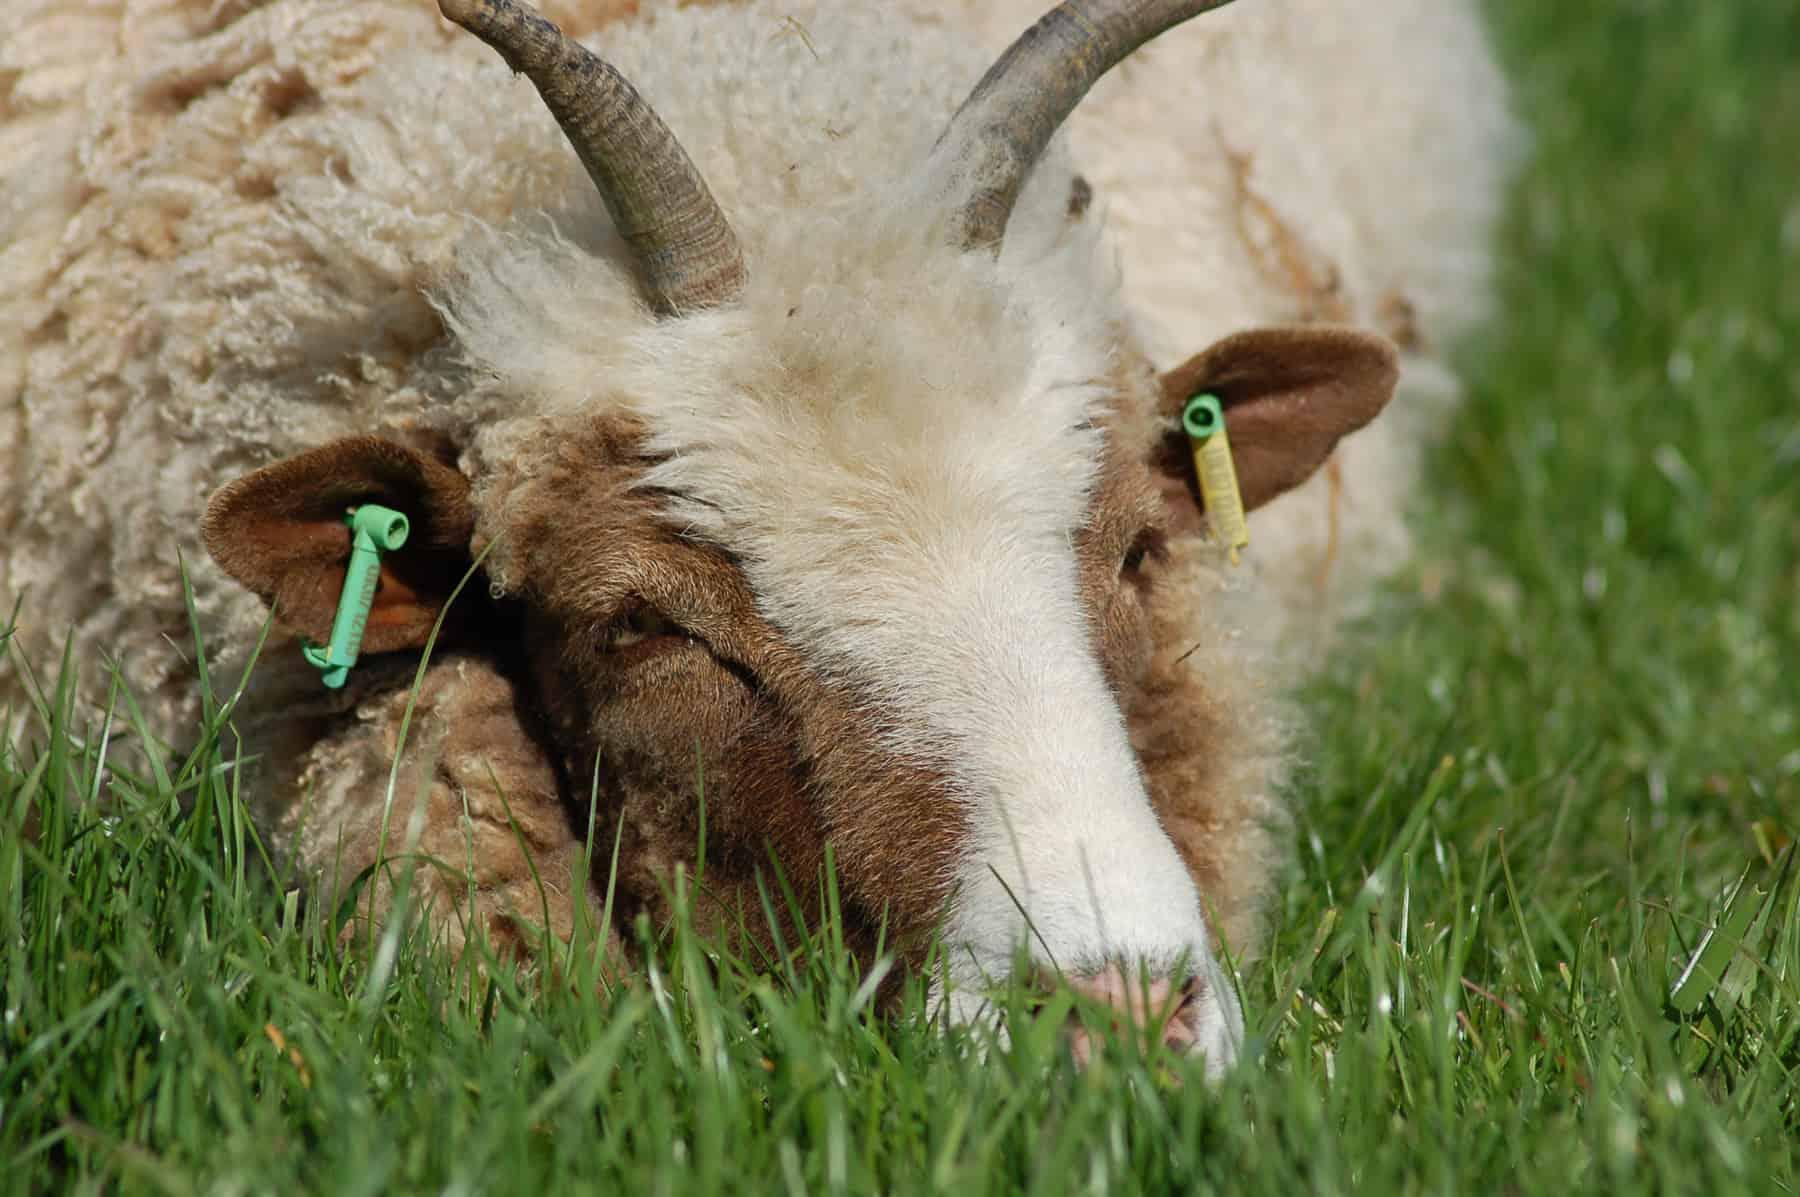 Muffn patchwork sheep moorit brown spotted jacob sheep shetland sheep